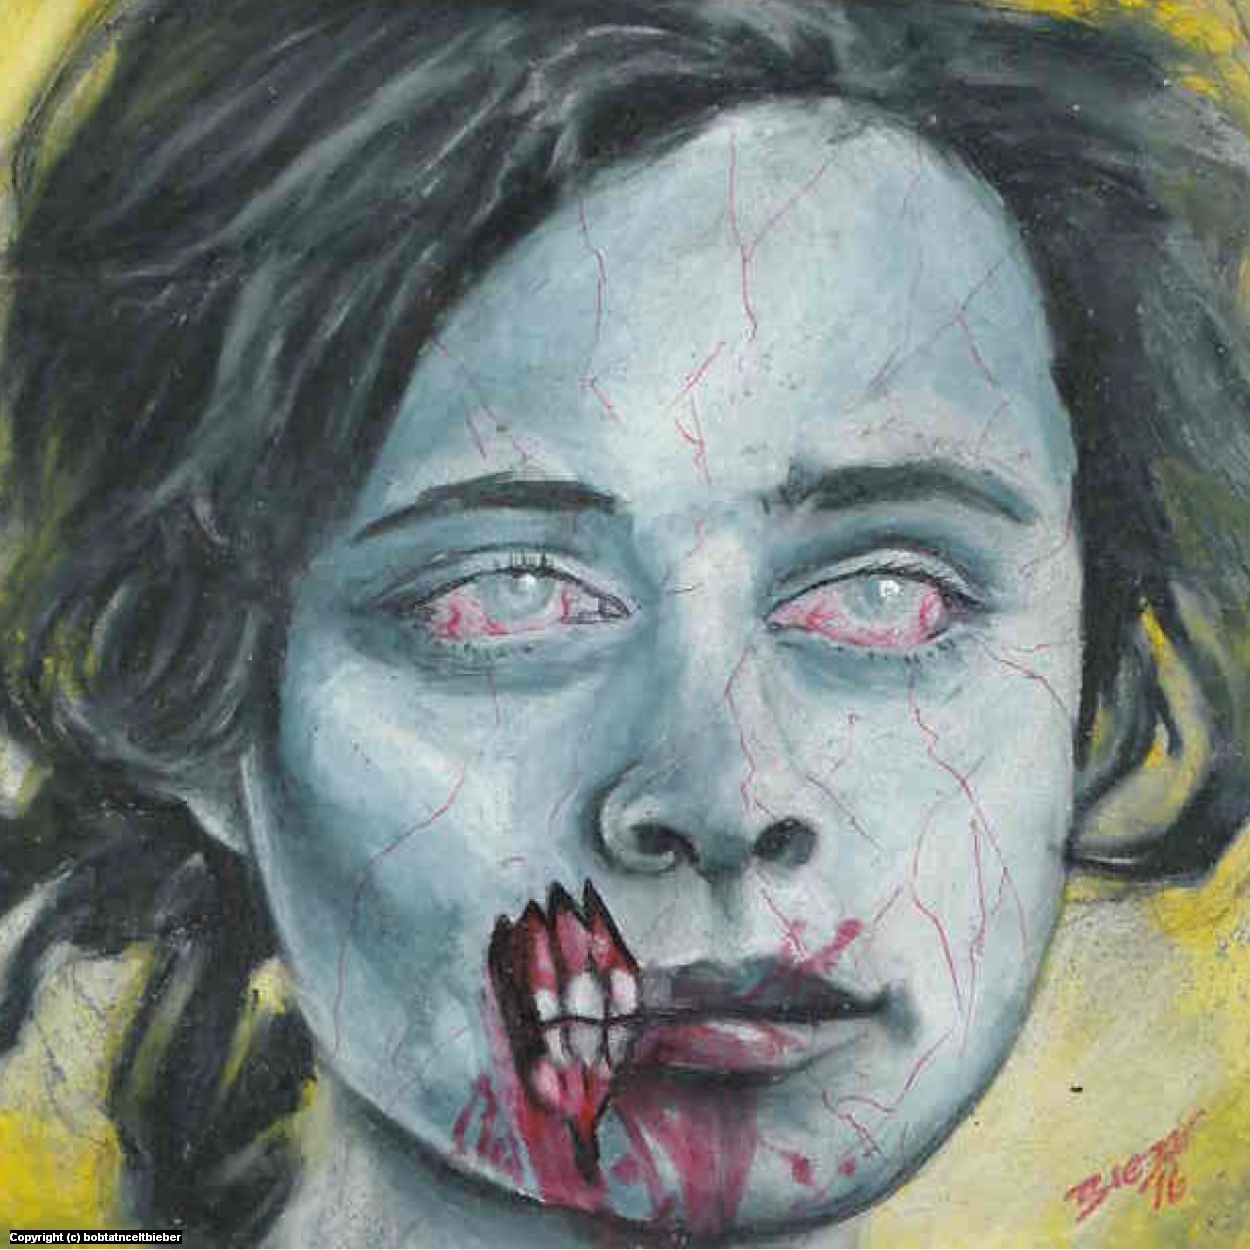 Ice Zombie Girl Artwork by Bob Bieber